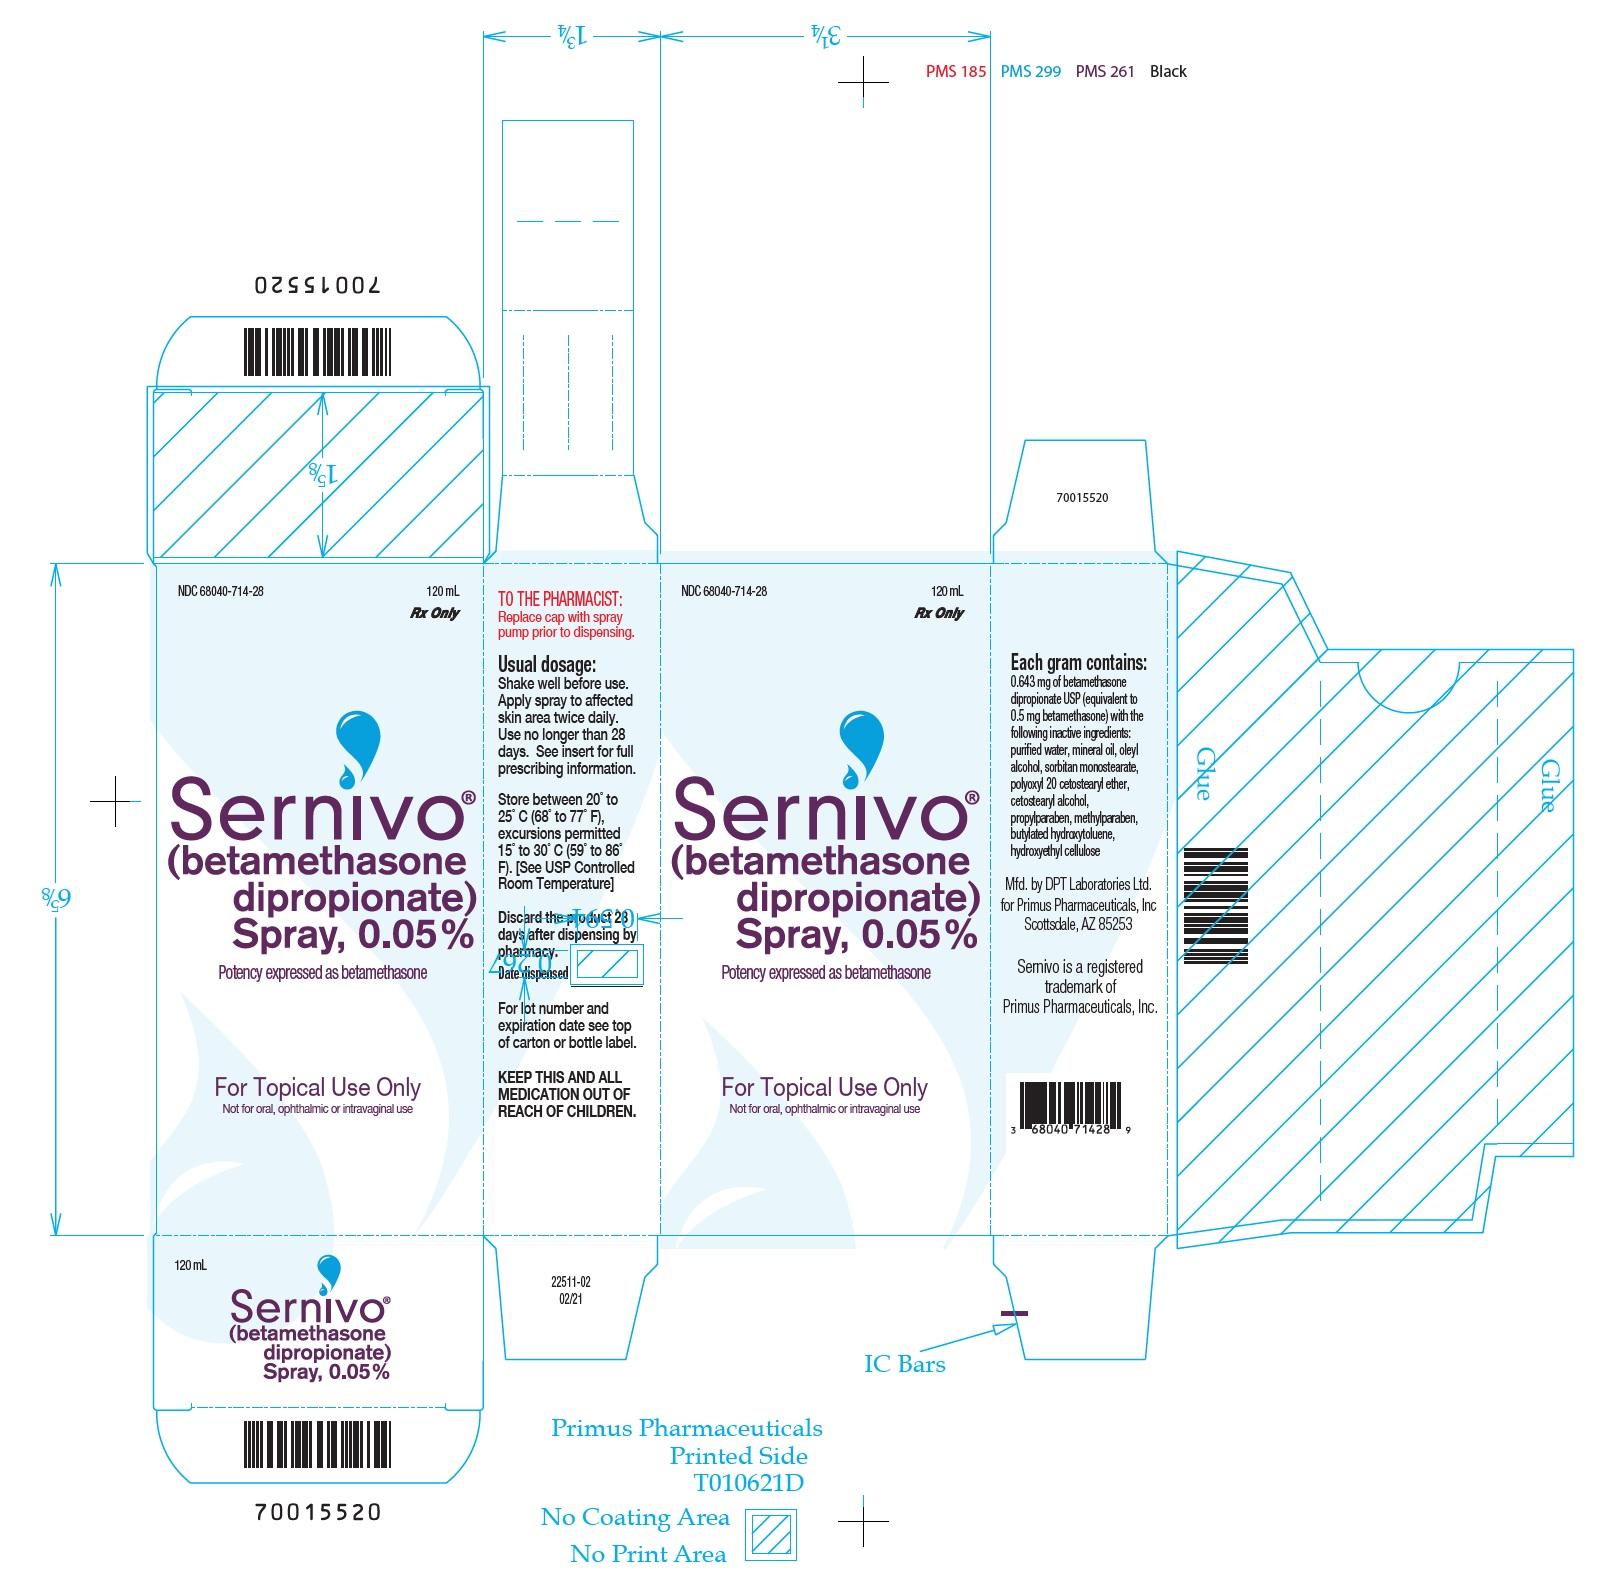 120 mL Carton Label